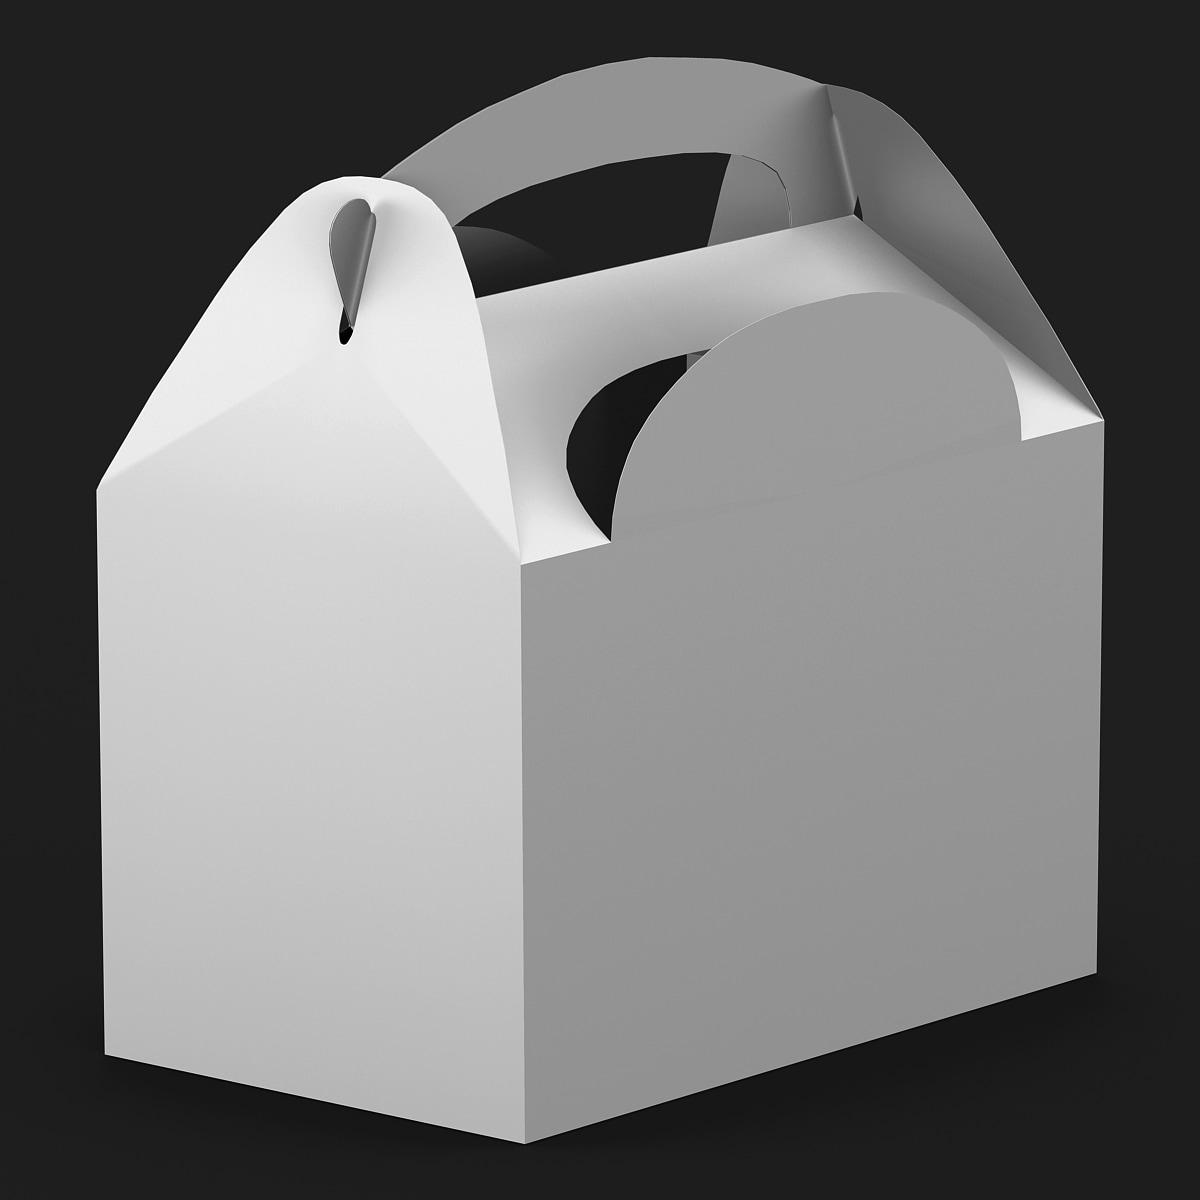 Food_Box_001.jpg